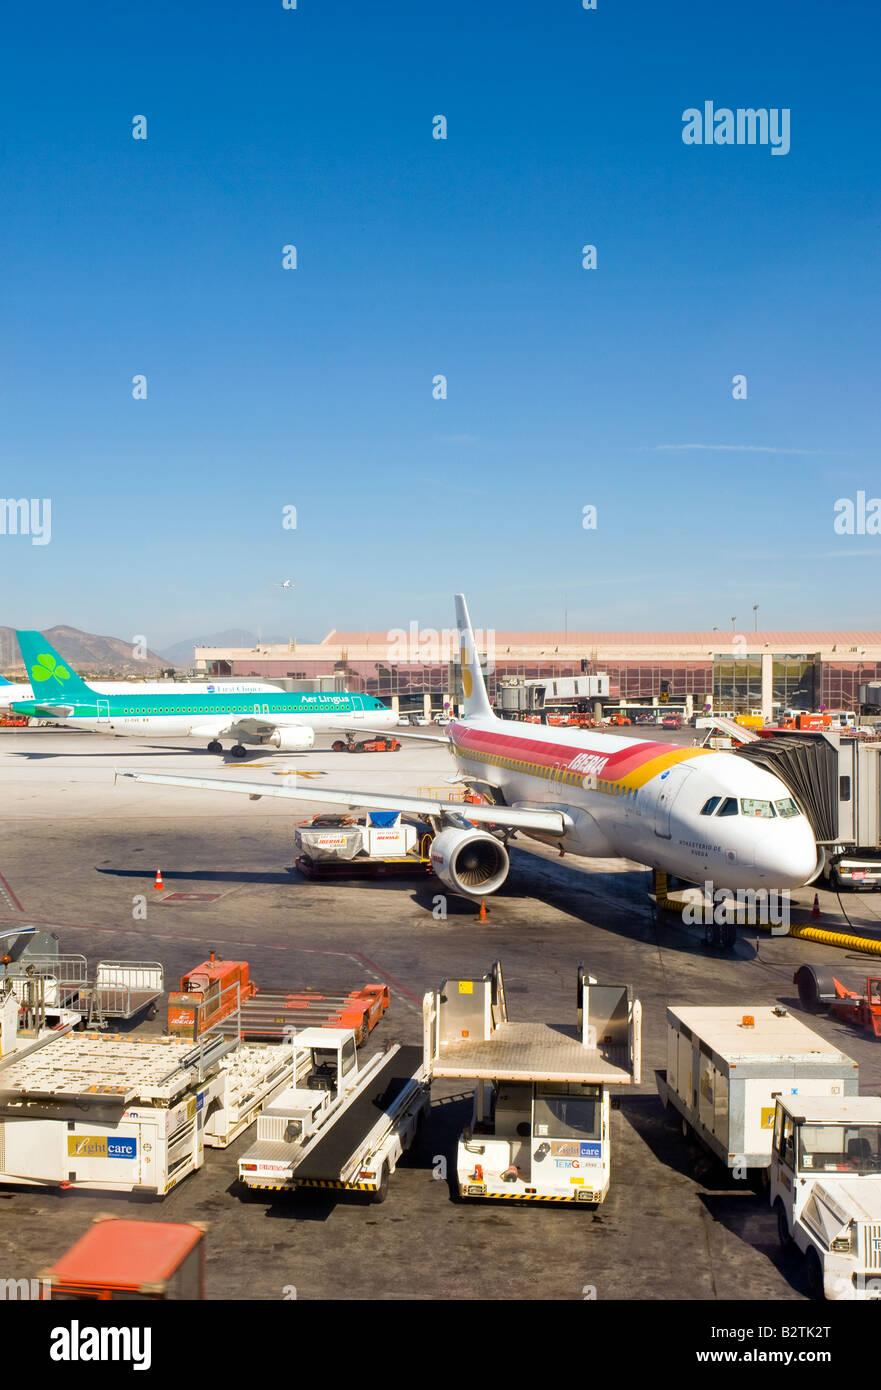 airport, aeroplane, aeroplanes, craft, ground maintenance, refuelling, refuel, airside - Stock Image